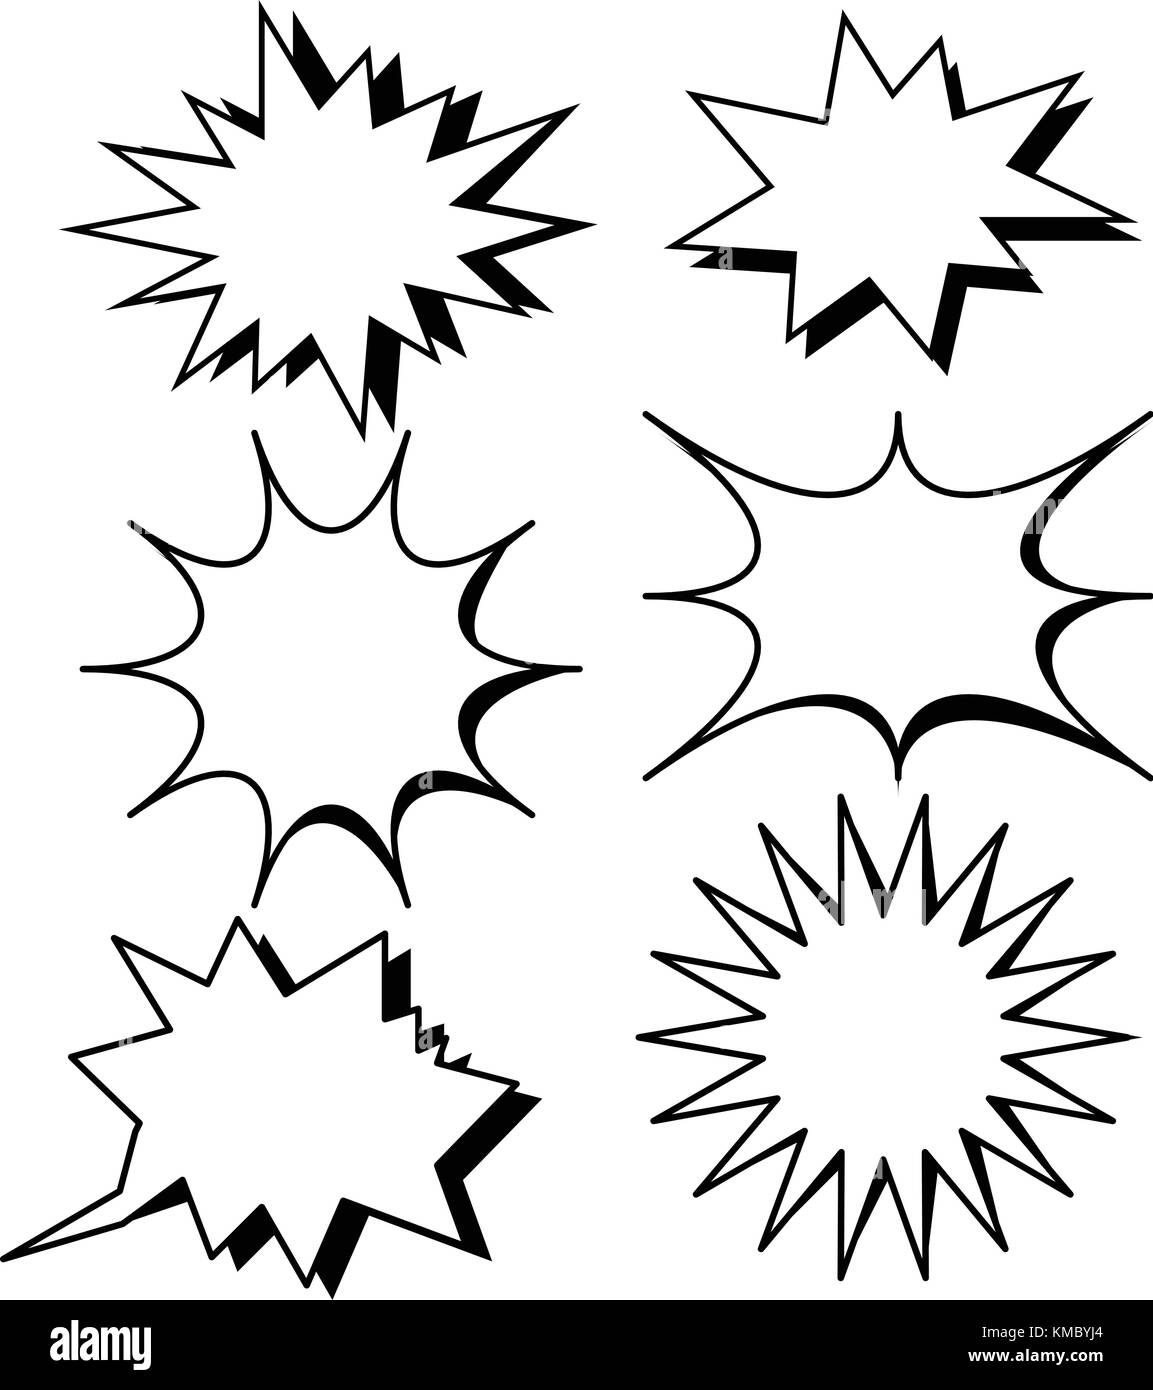 Leere Vorlage Comic Text Sprechblase star Vektor. Dialog leere Box ...